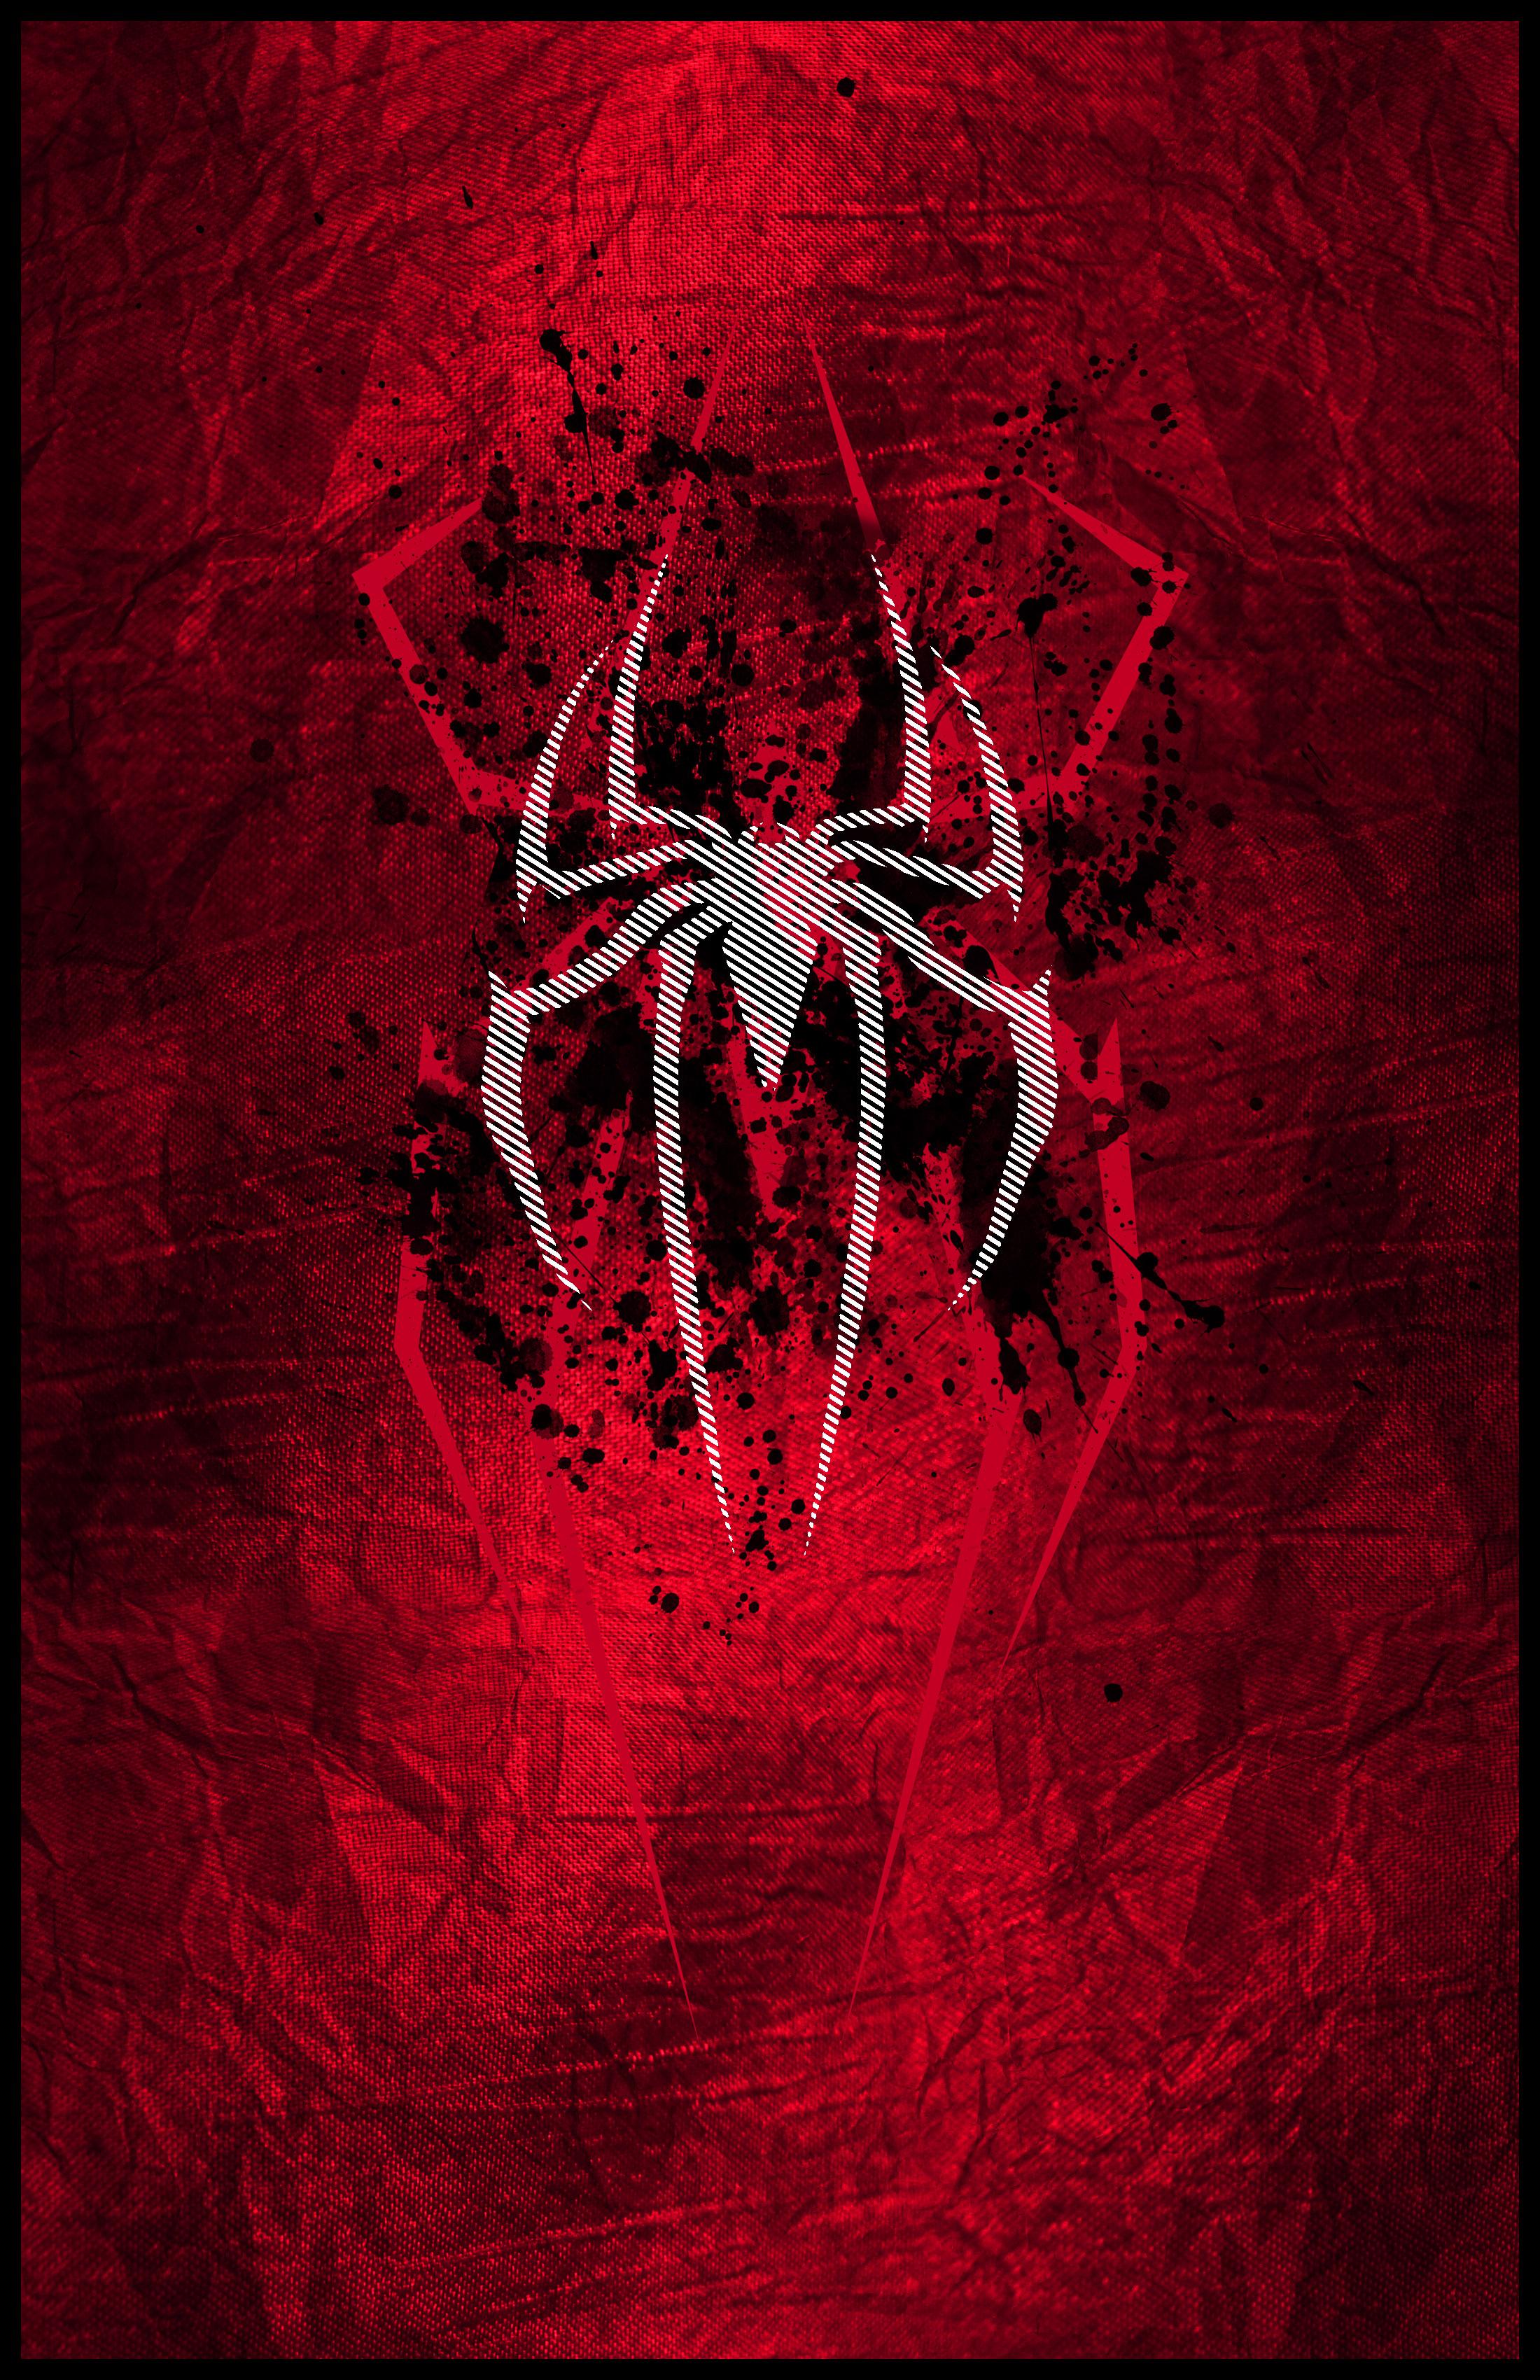 spiderman wallpaper iphone 6